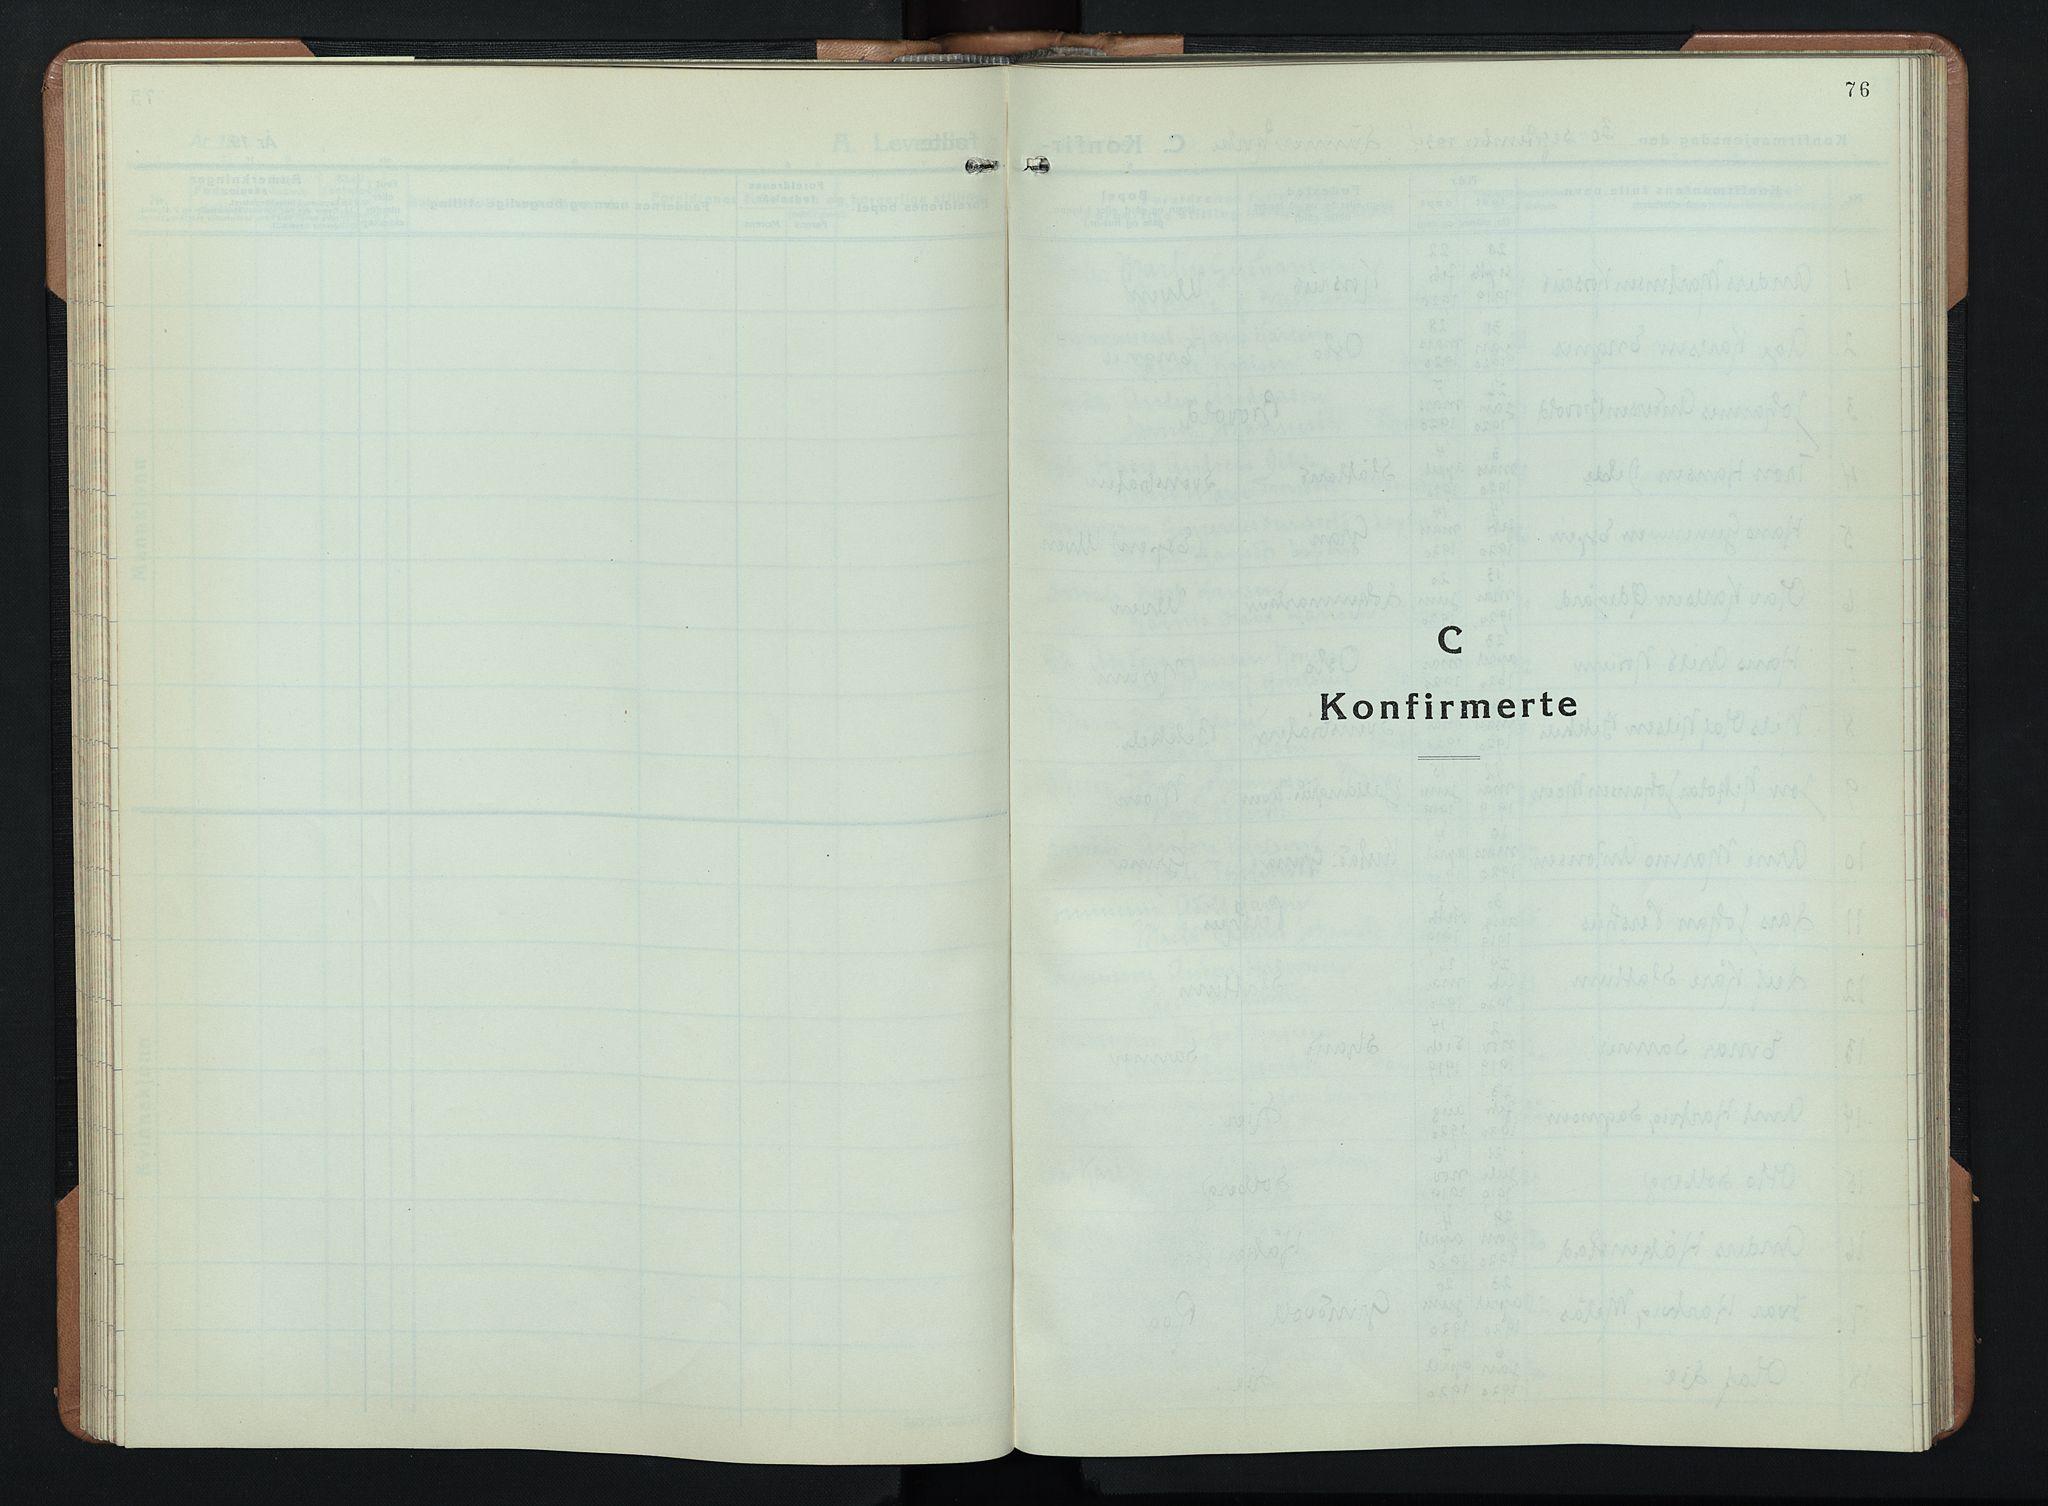 SAH, Lunner prestekontor, H/Ha/Hab/L0003: Klokkerbok nr. 3, 1933-1945, s. 76